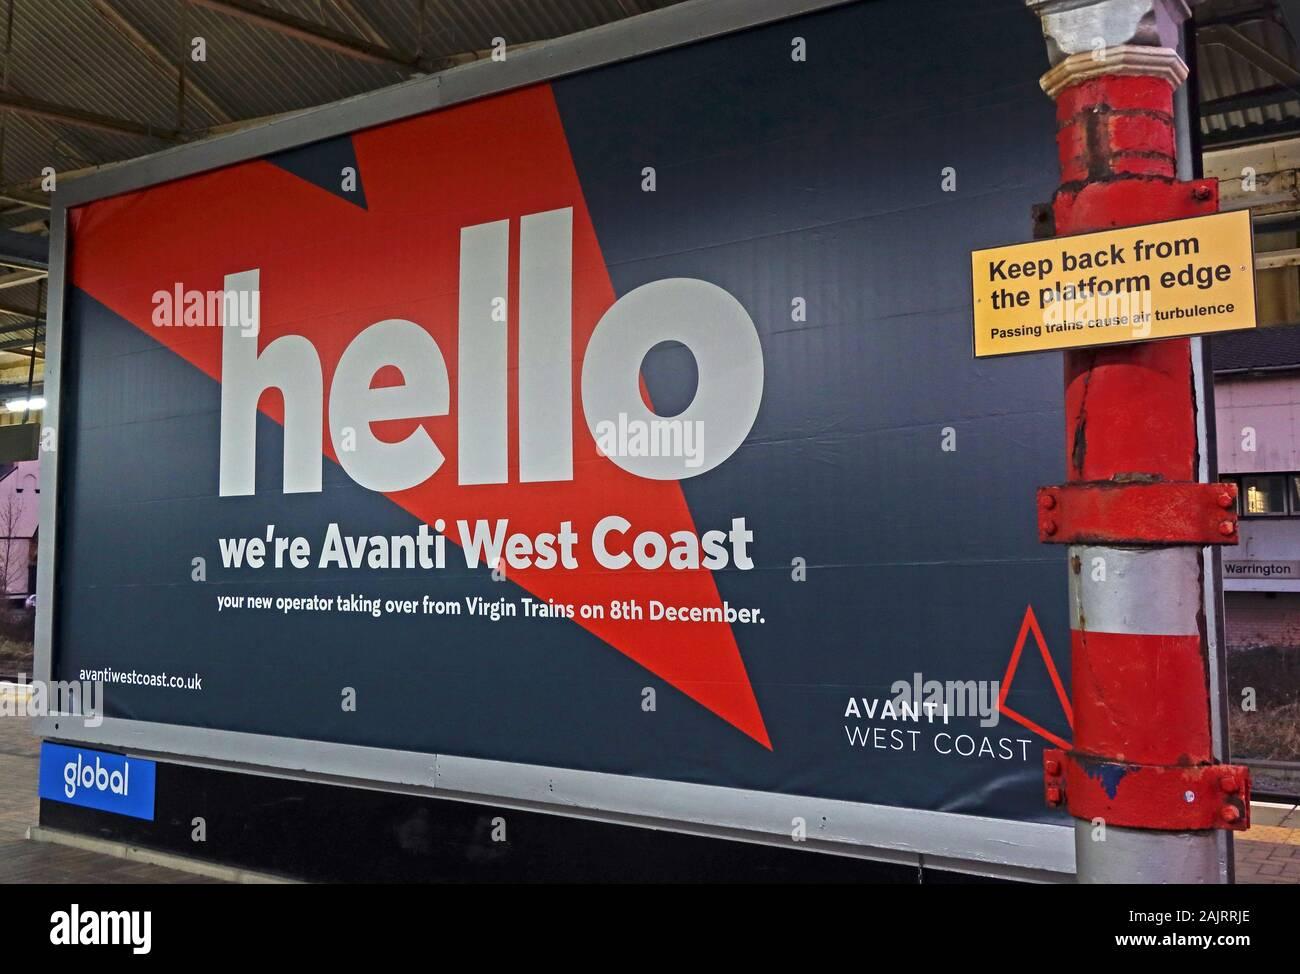 GoTonySmith,HotpixUK,@HotpixUK,Dec 2019,Virgin Trains,franchise,TOC,train operating company,delays,complaints,WBQ,train,rail,railway,UK,England,British Rail,British,Avanti West Coast,re-brand,rebranded,new brand,Avanti FirstGroup TrenItalia,Warrington,Cheshire,advert,advertisement,publicity,evening,WCP,platform,station,WA1,Keep away from Platform edge,red,orange,West Coast